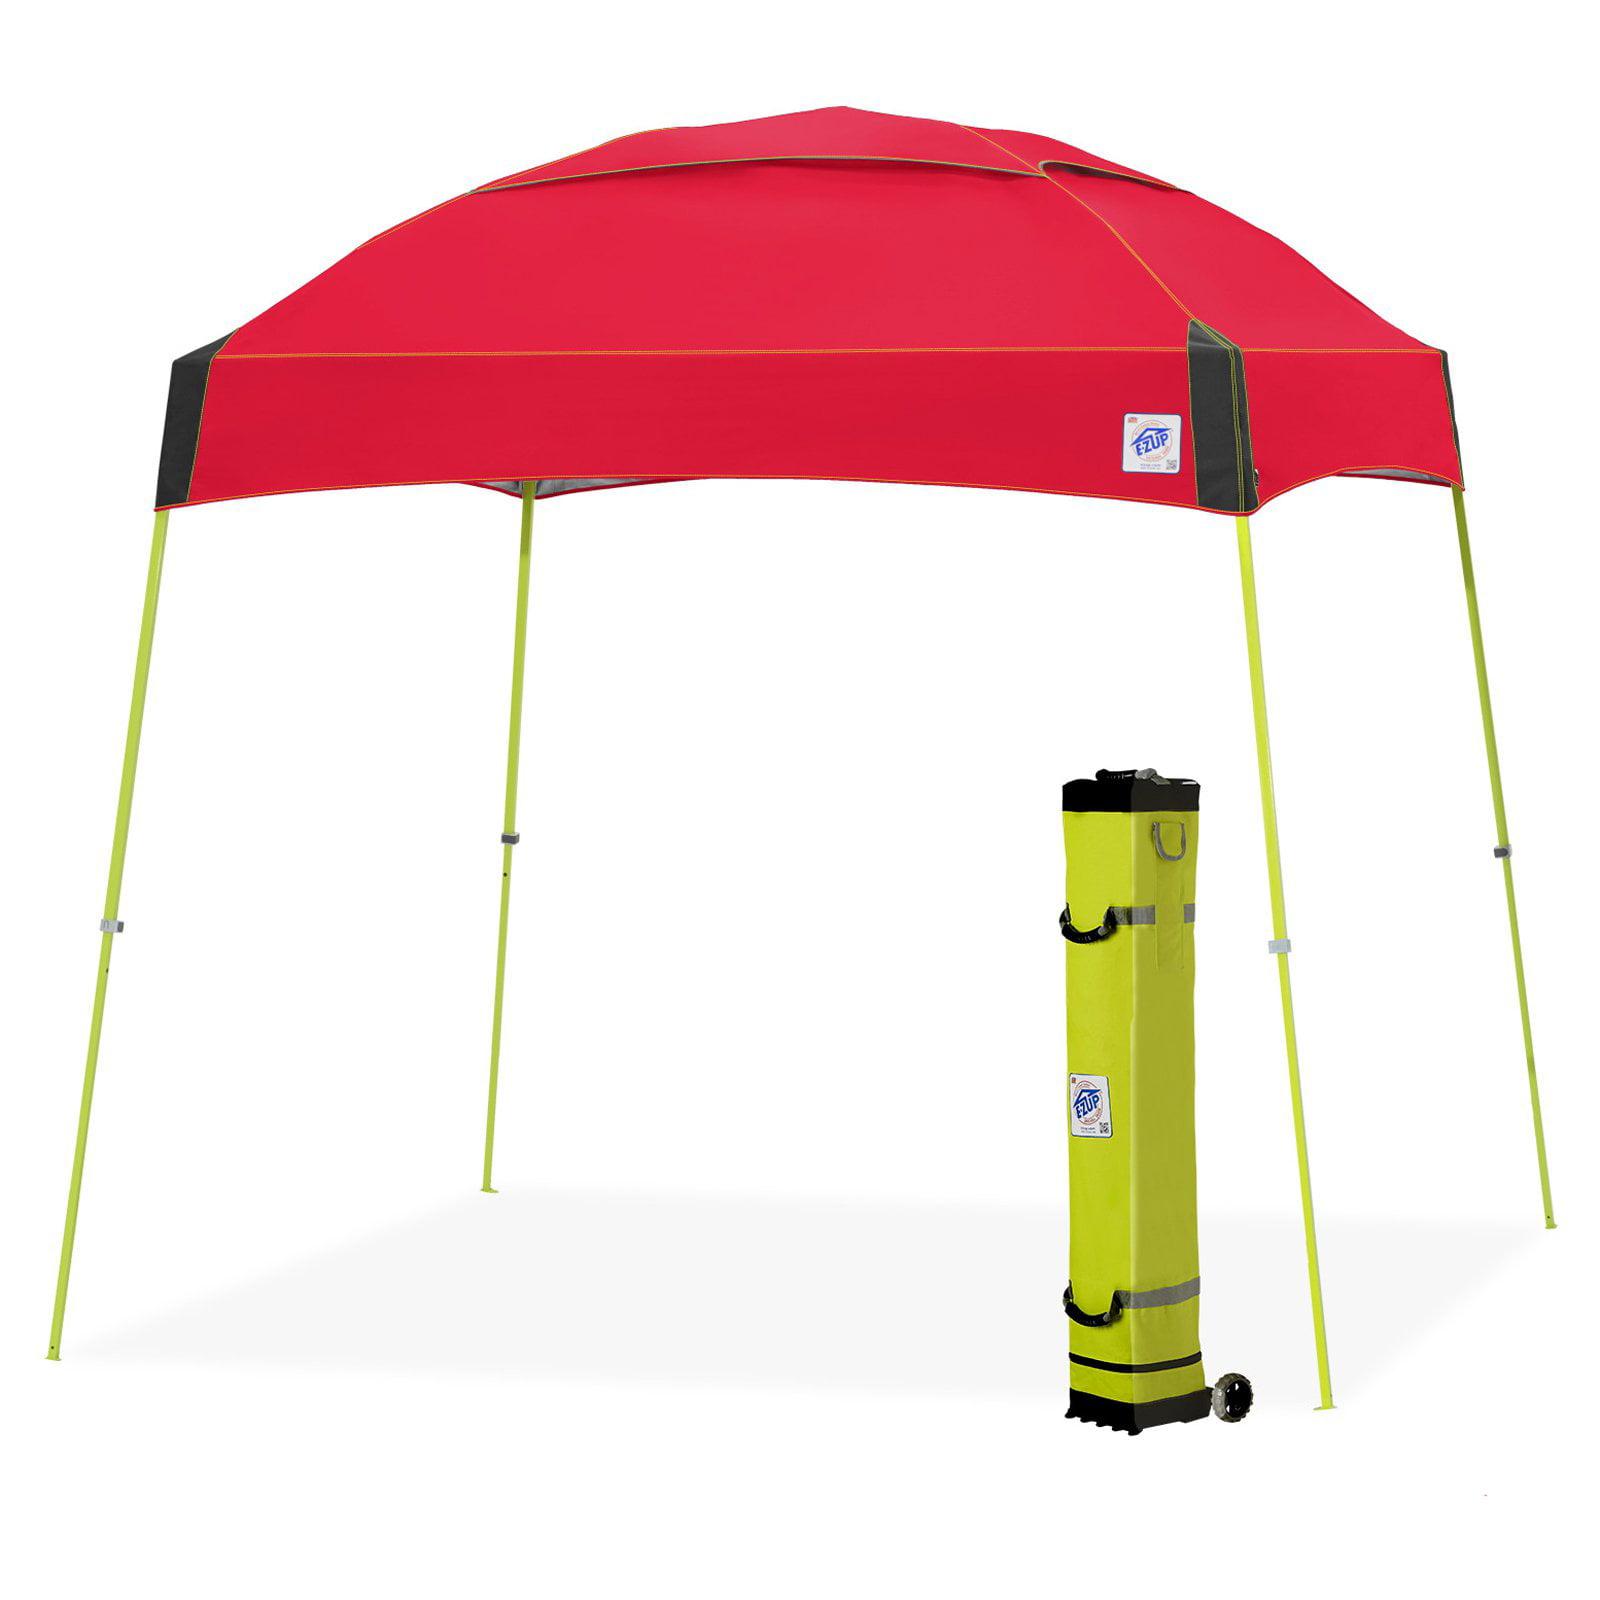 sc 1 st  Walmart & E-Z UPu0026reg; 10x10 ft. Dome Canopy - Walmart.com